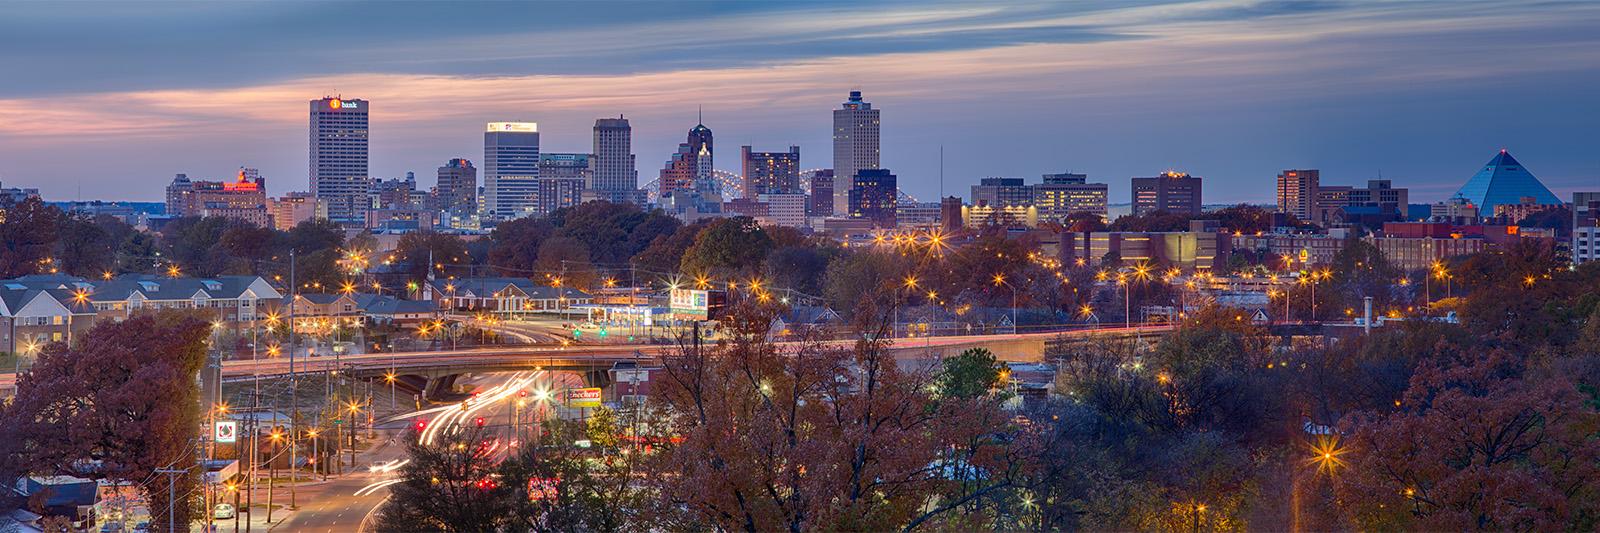 Memphis-BEST-panorama-1600.jpg